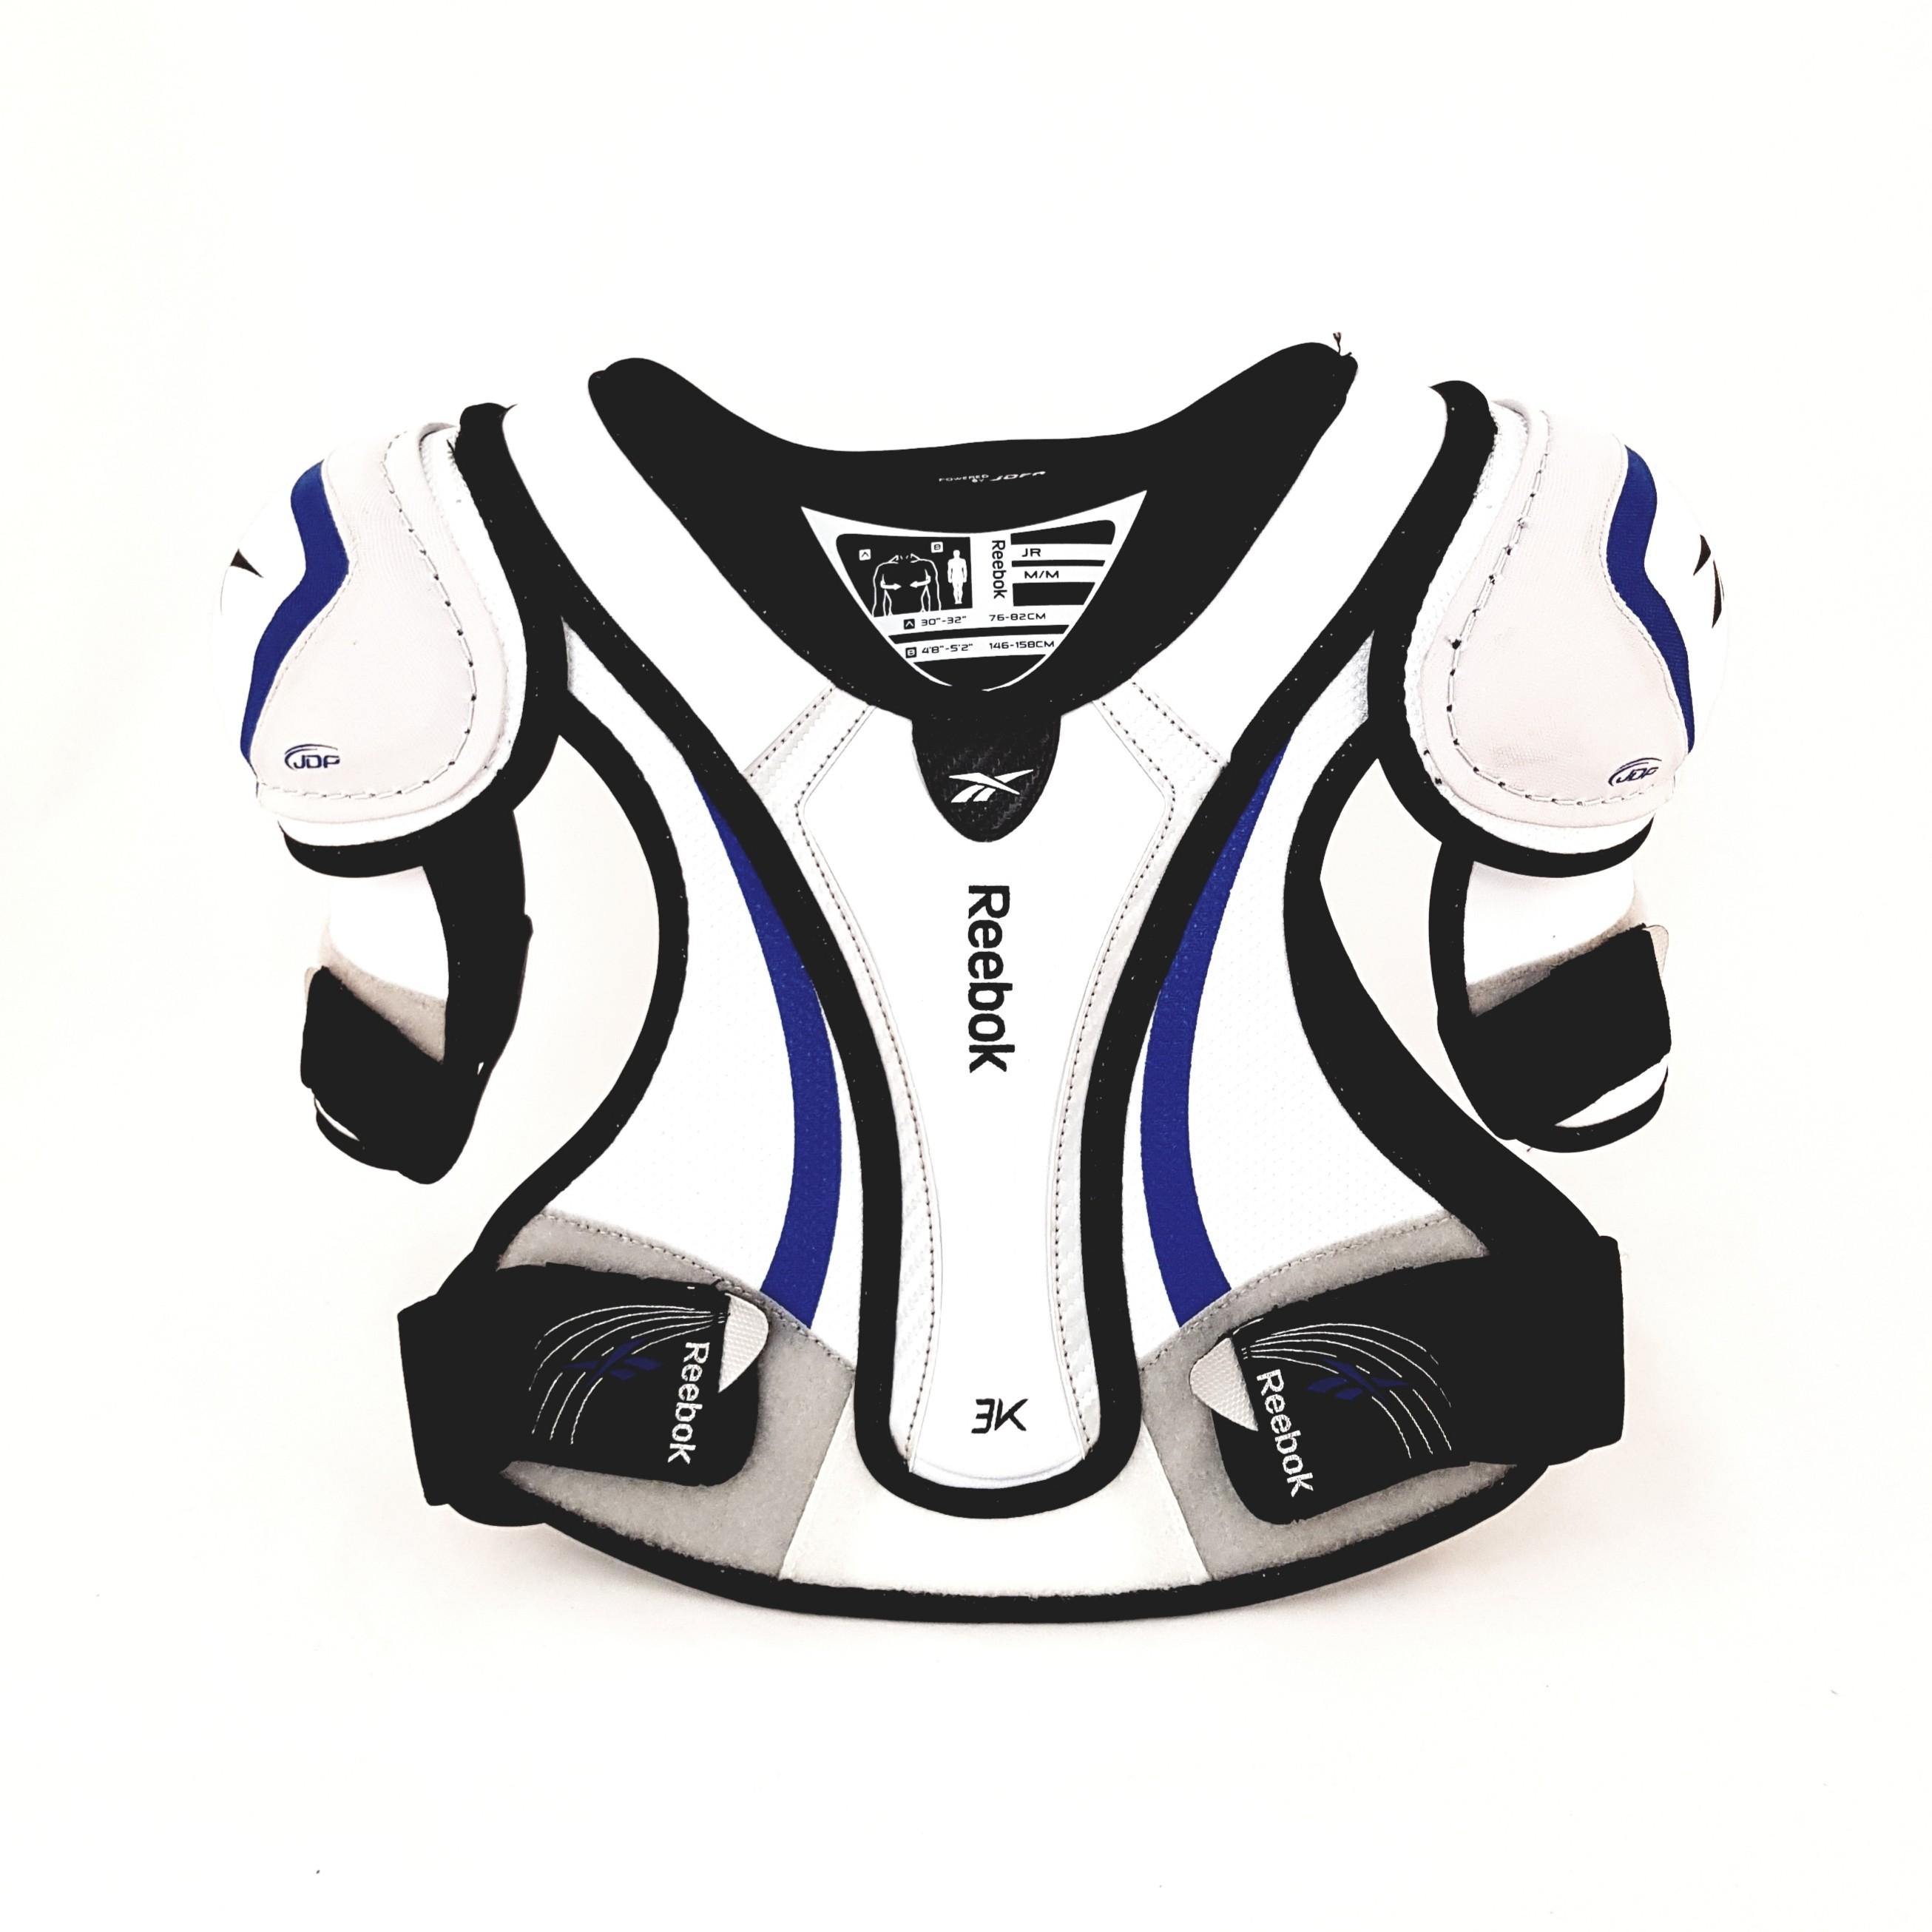 REEBOK 3K White Edition Junioru Plecu Sargs